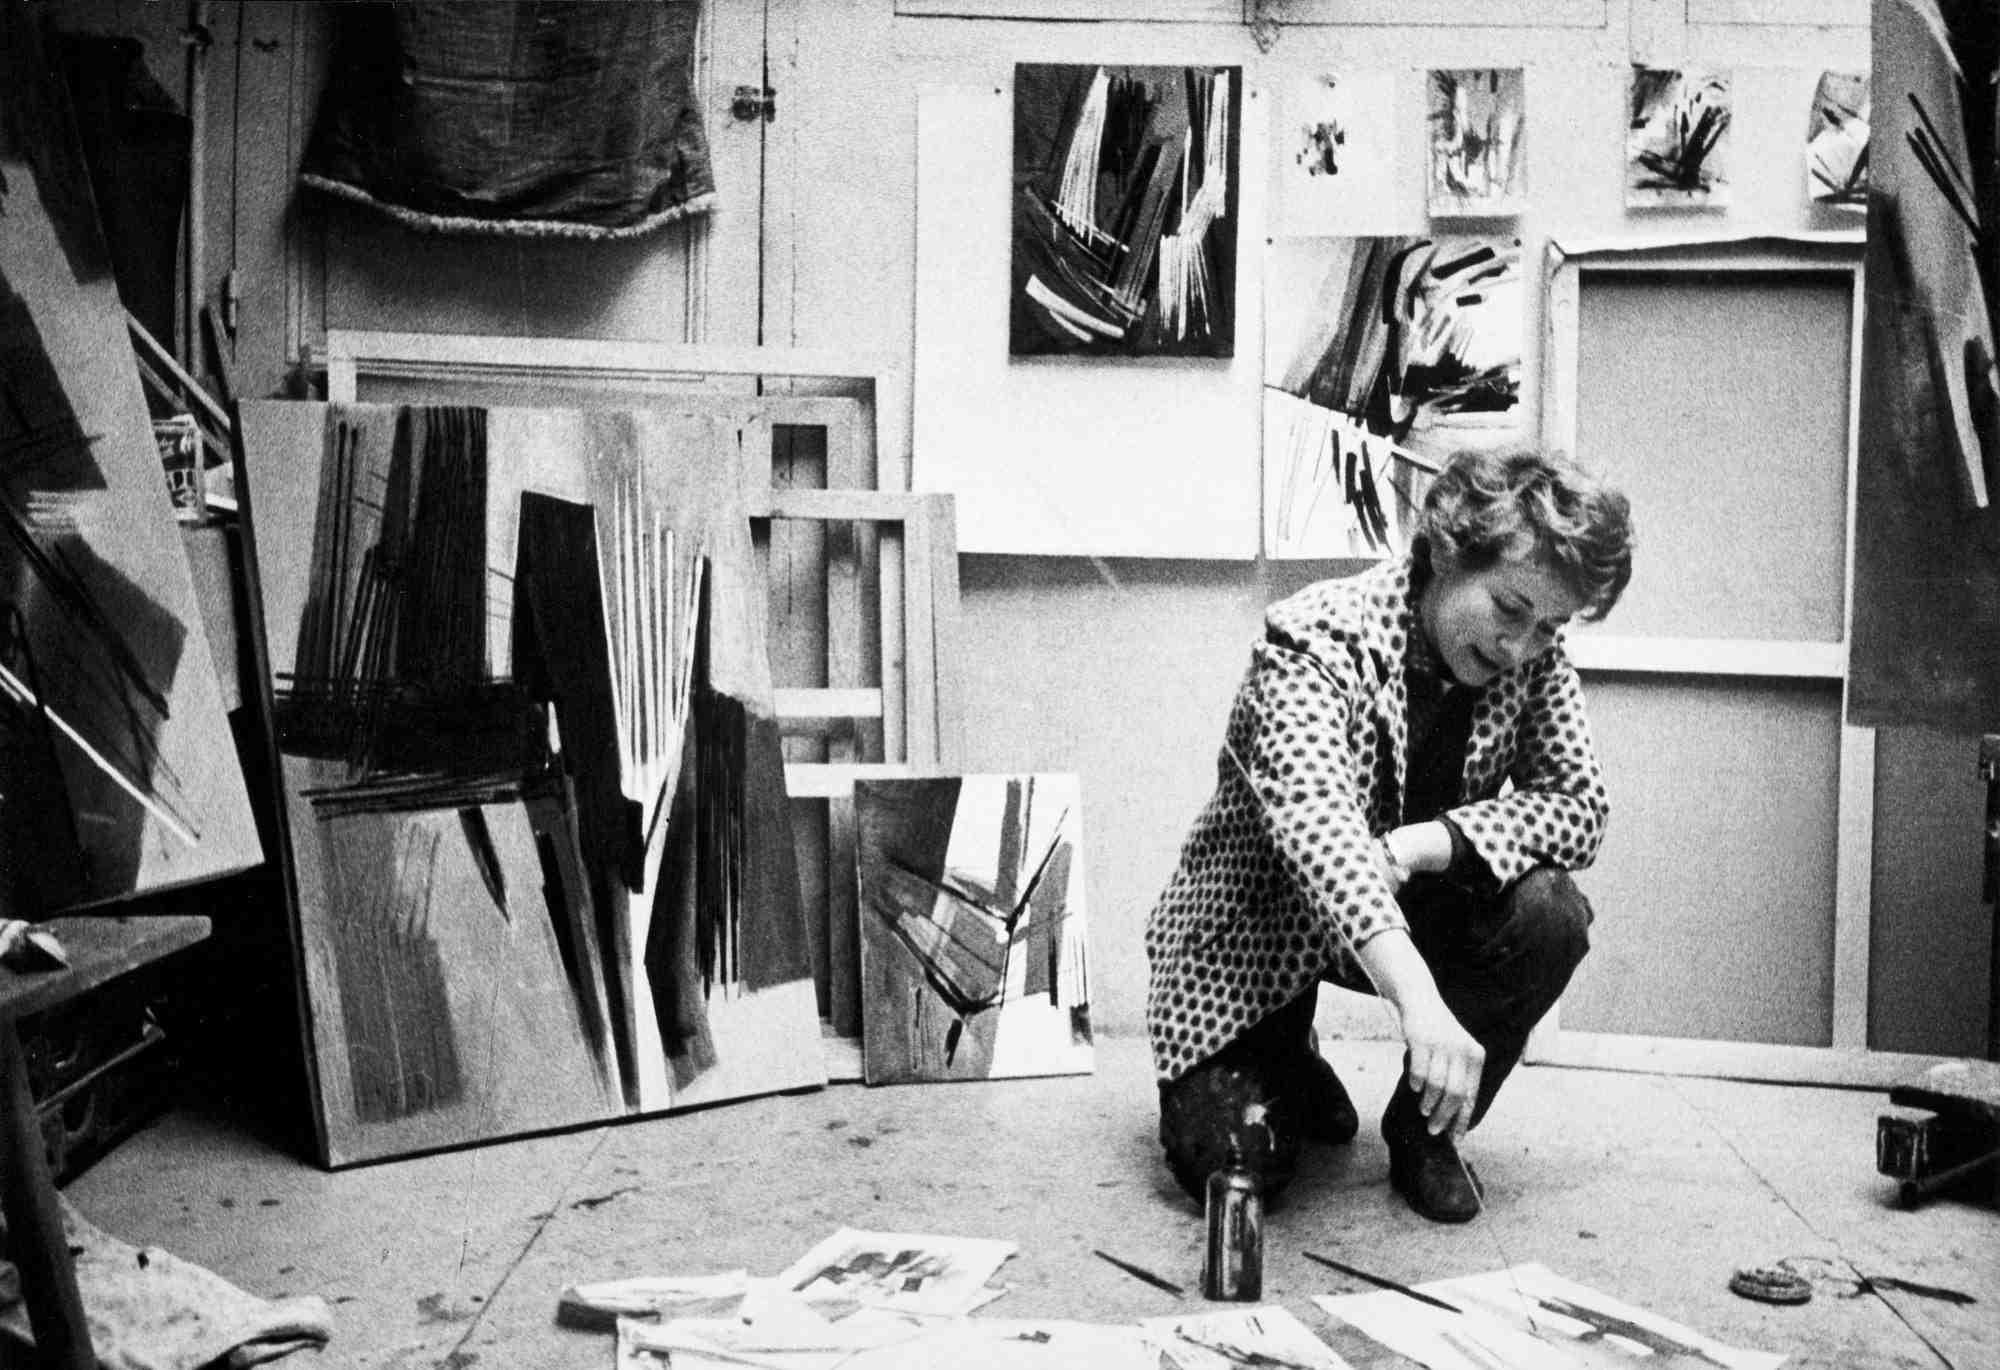 huguette arthur bertrand - studio newsletter art comes to you 7